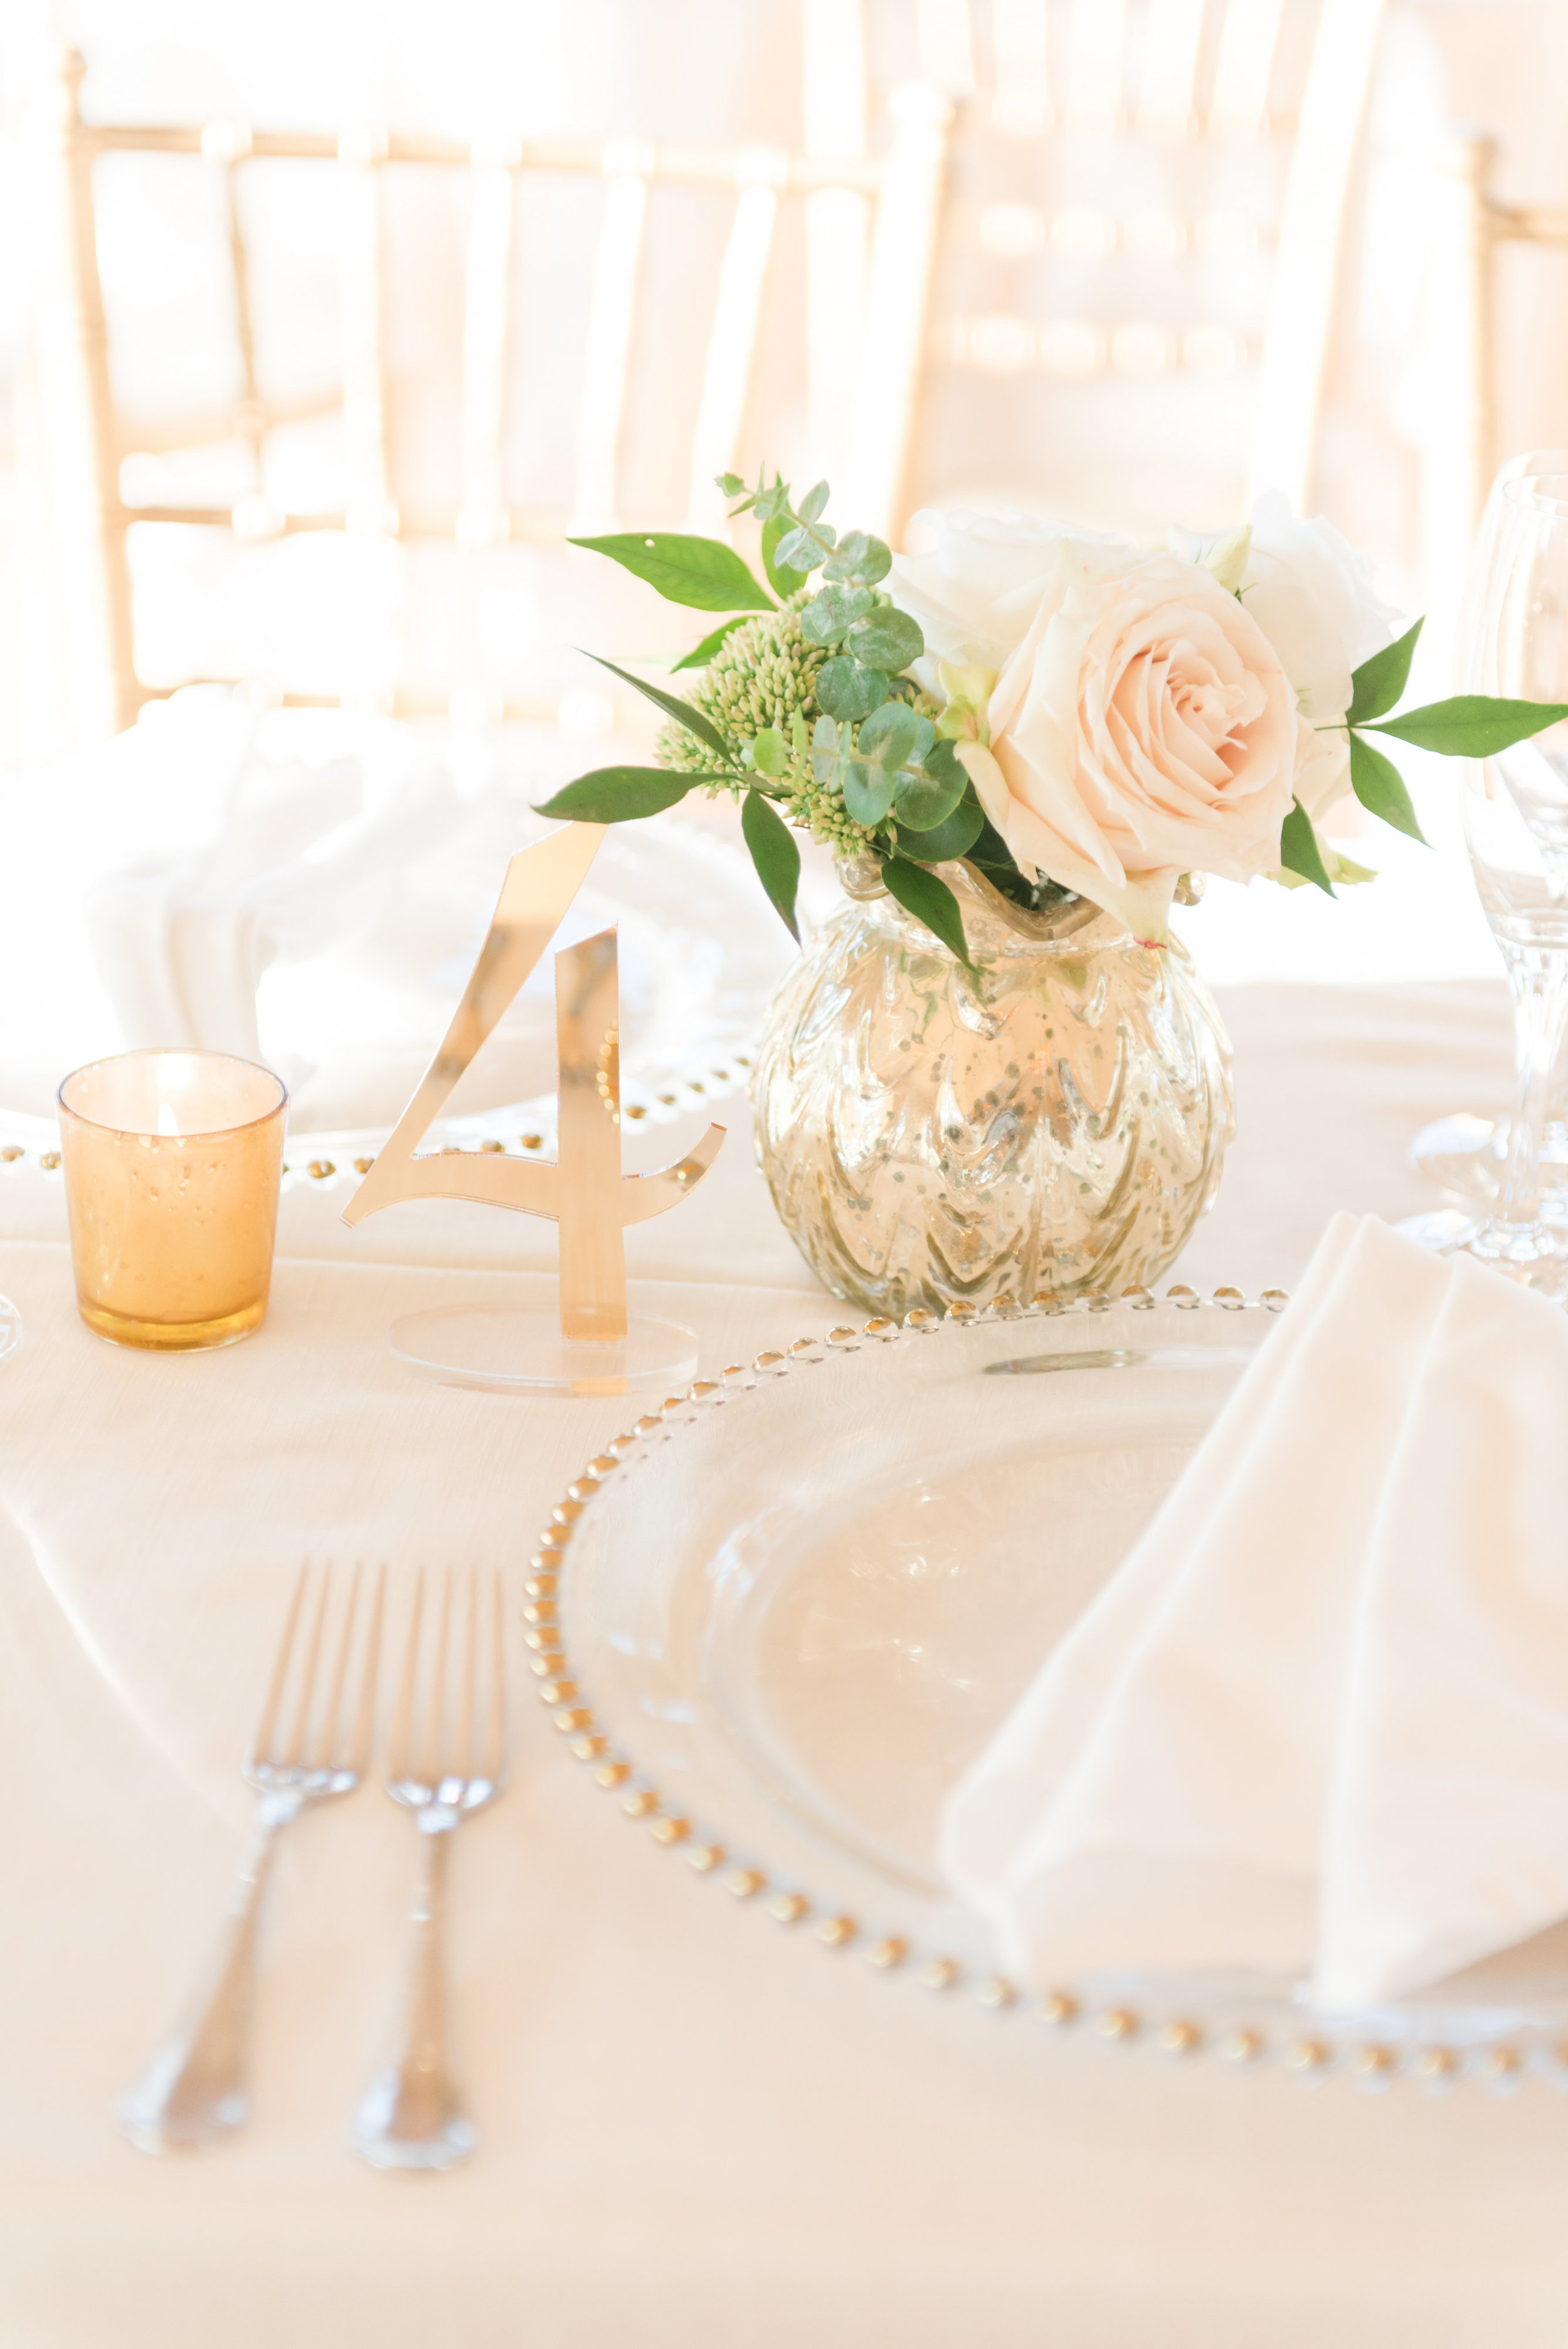 MORAIS VINEYARDS WEDDING A BEYOUTIFUL FETE EVENTS & DESIGN  - VIRGINIA AND DC WEDDING PLANNER 23.jpg